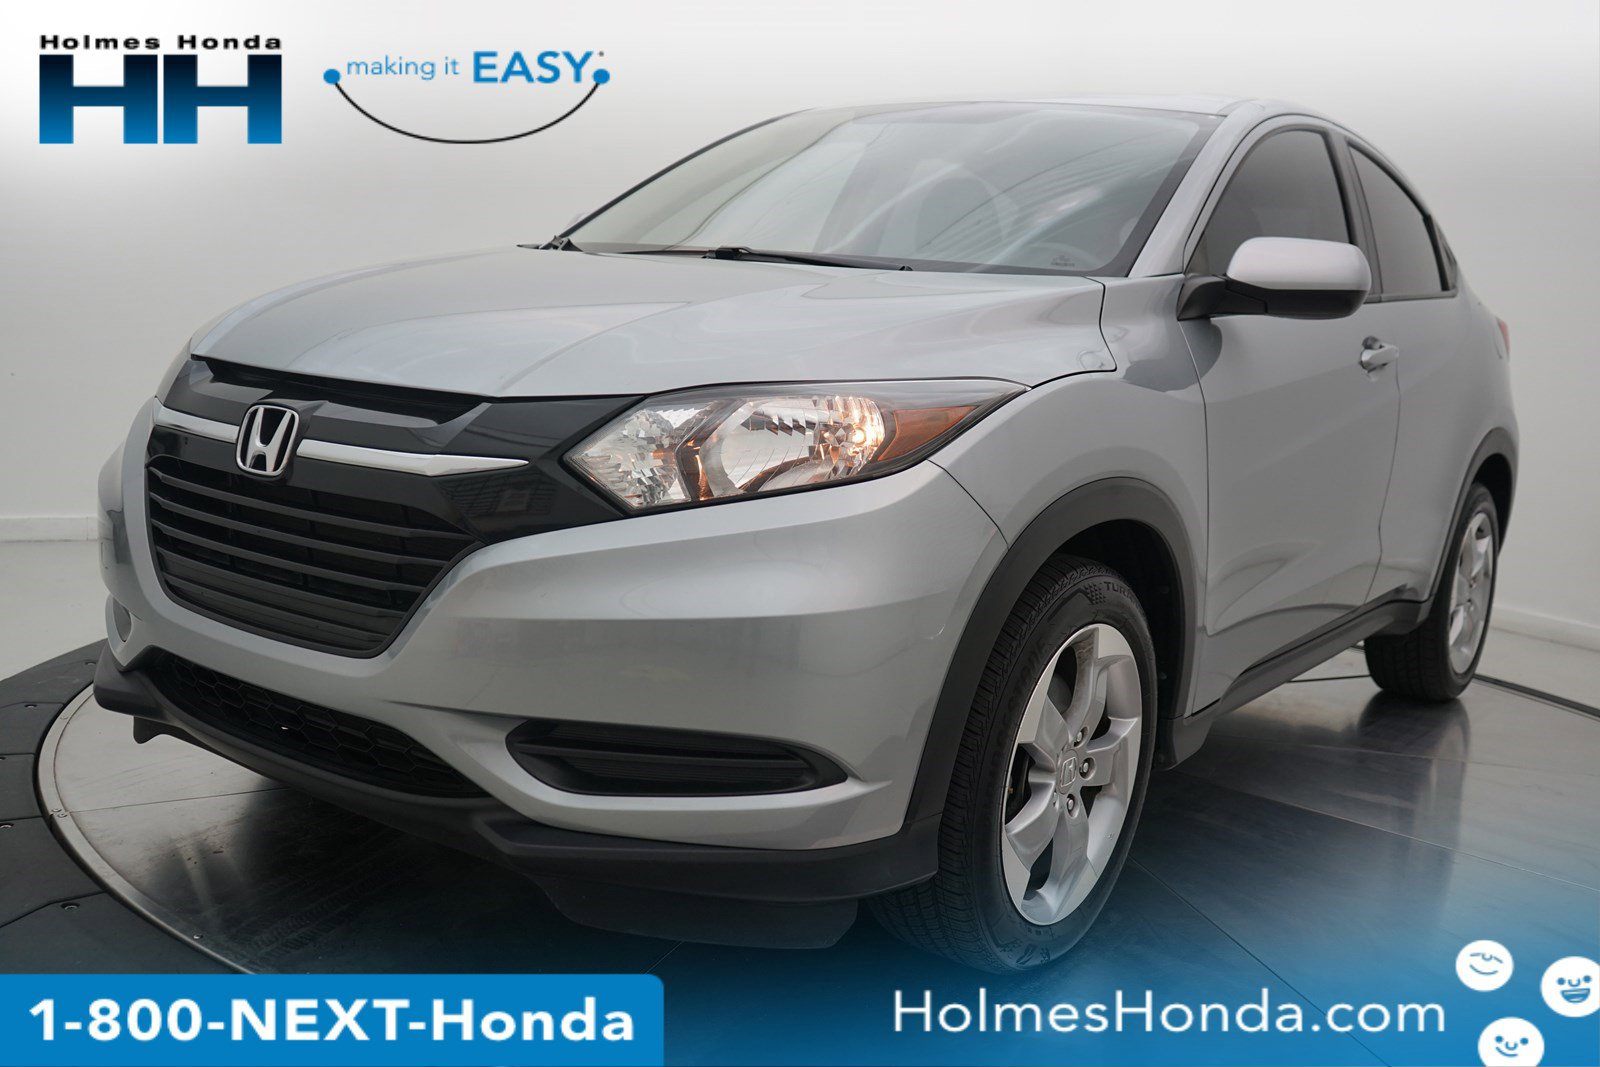 2017 Honda HR-V FWD LX image